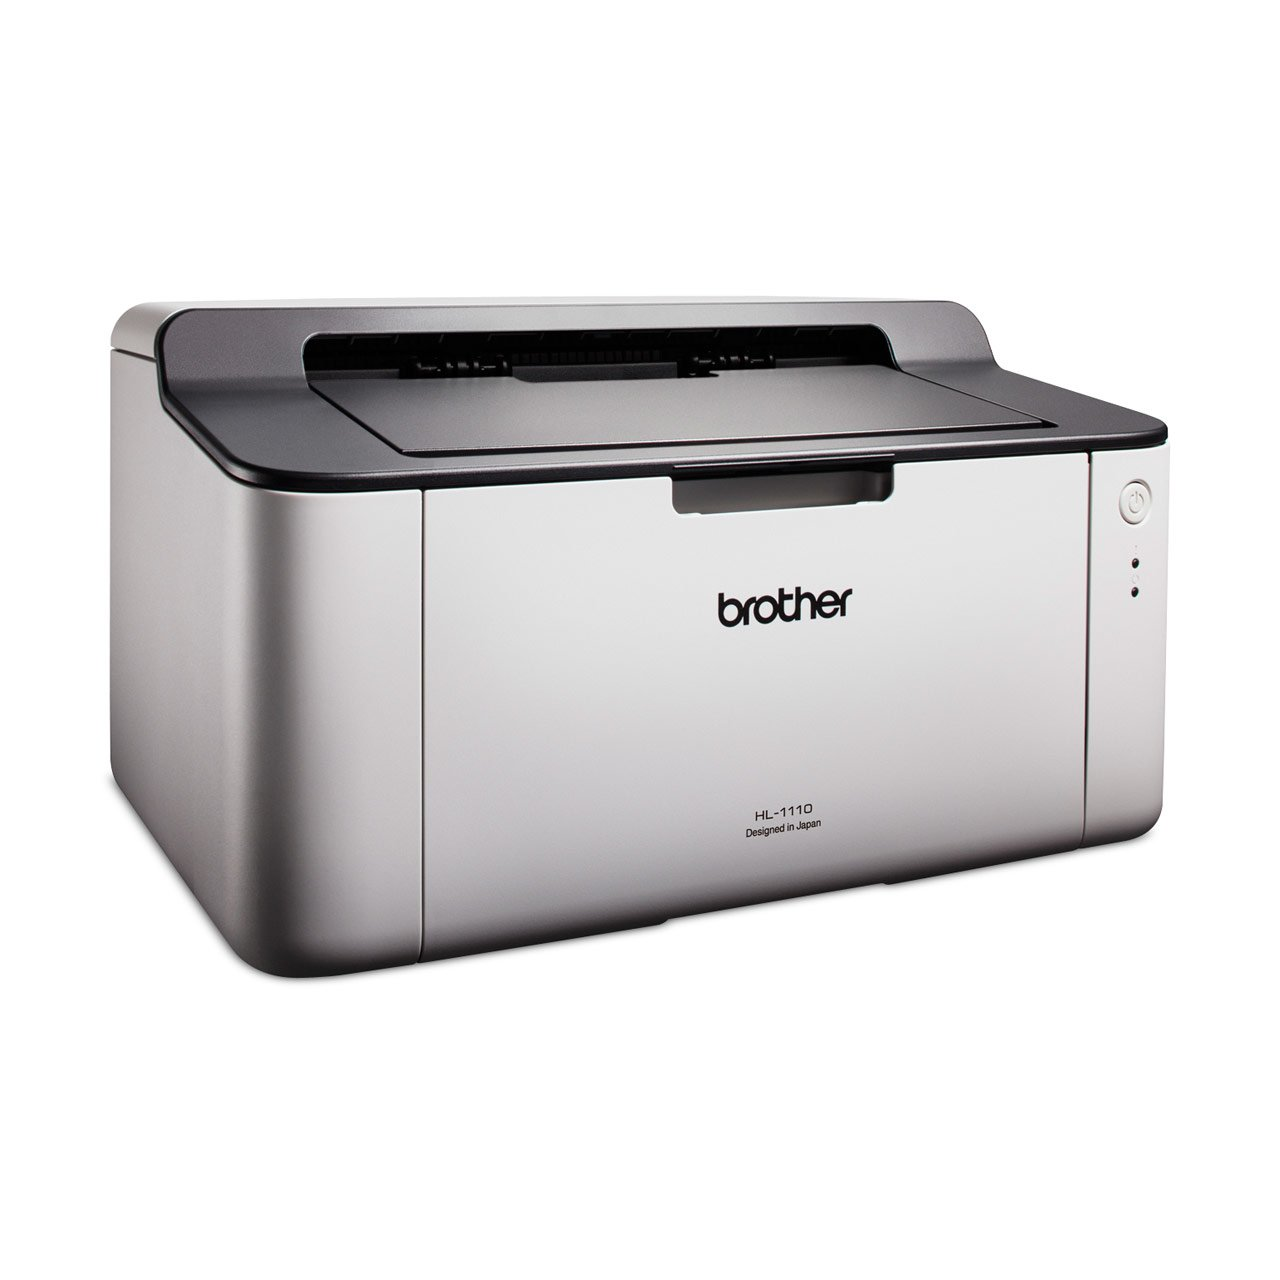 Brother HL-1110 - Impresora láser (GDI, USB 1.1, USB 2.0, 2400 x ...